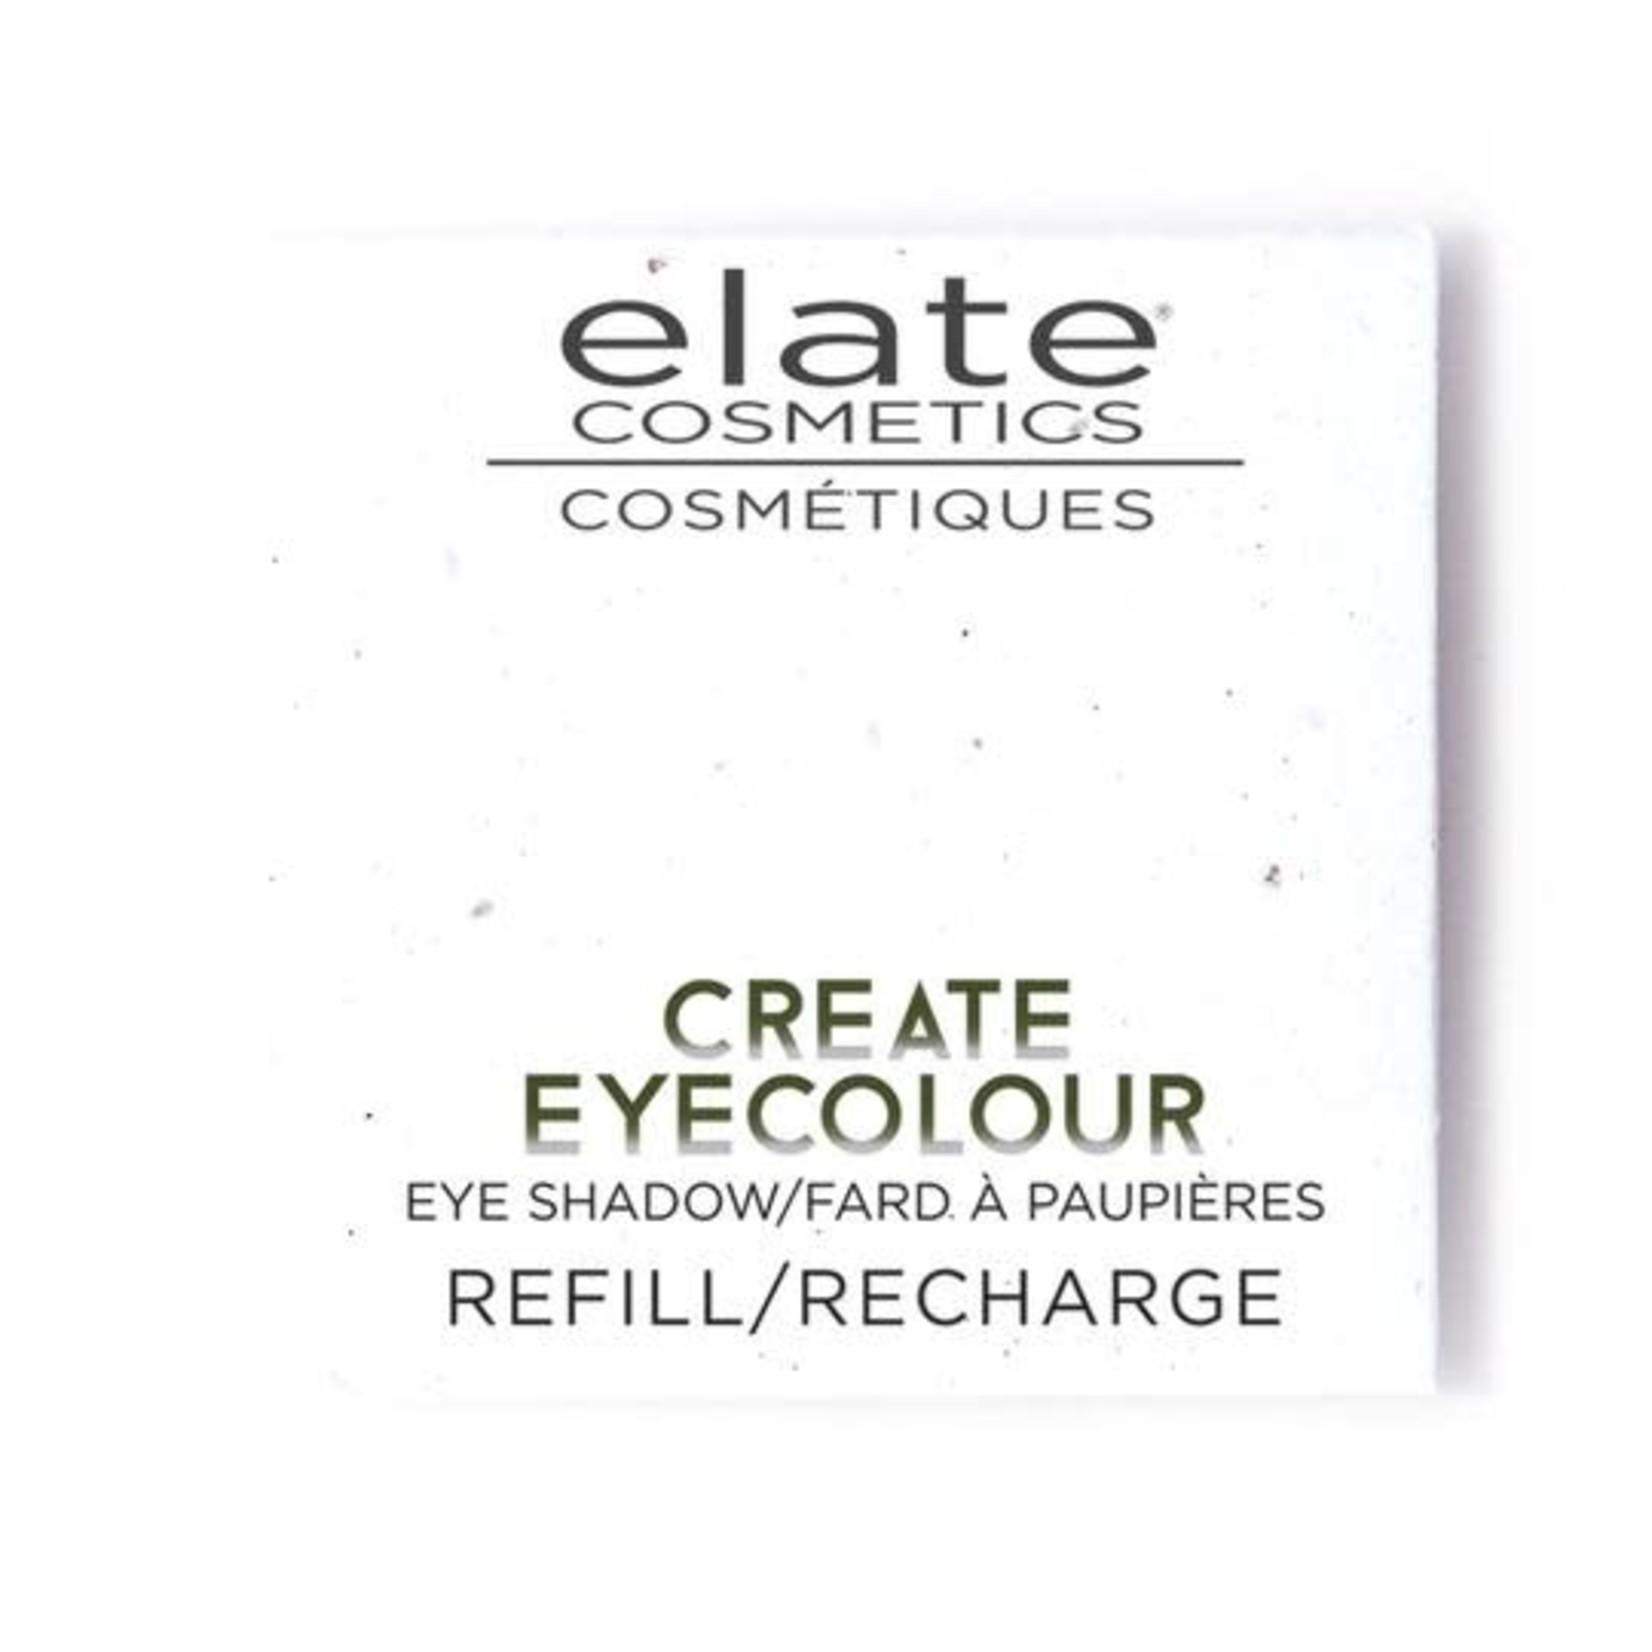 ELATE COSMETICS PRESSED EYECOLOUR - QUINTESSENCE